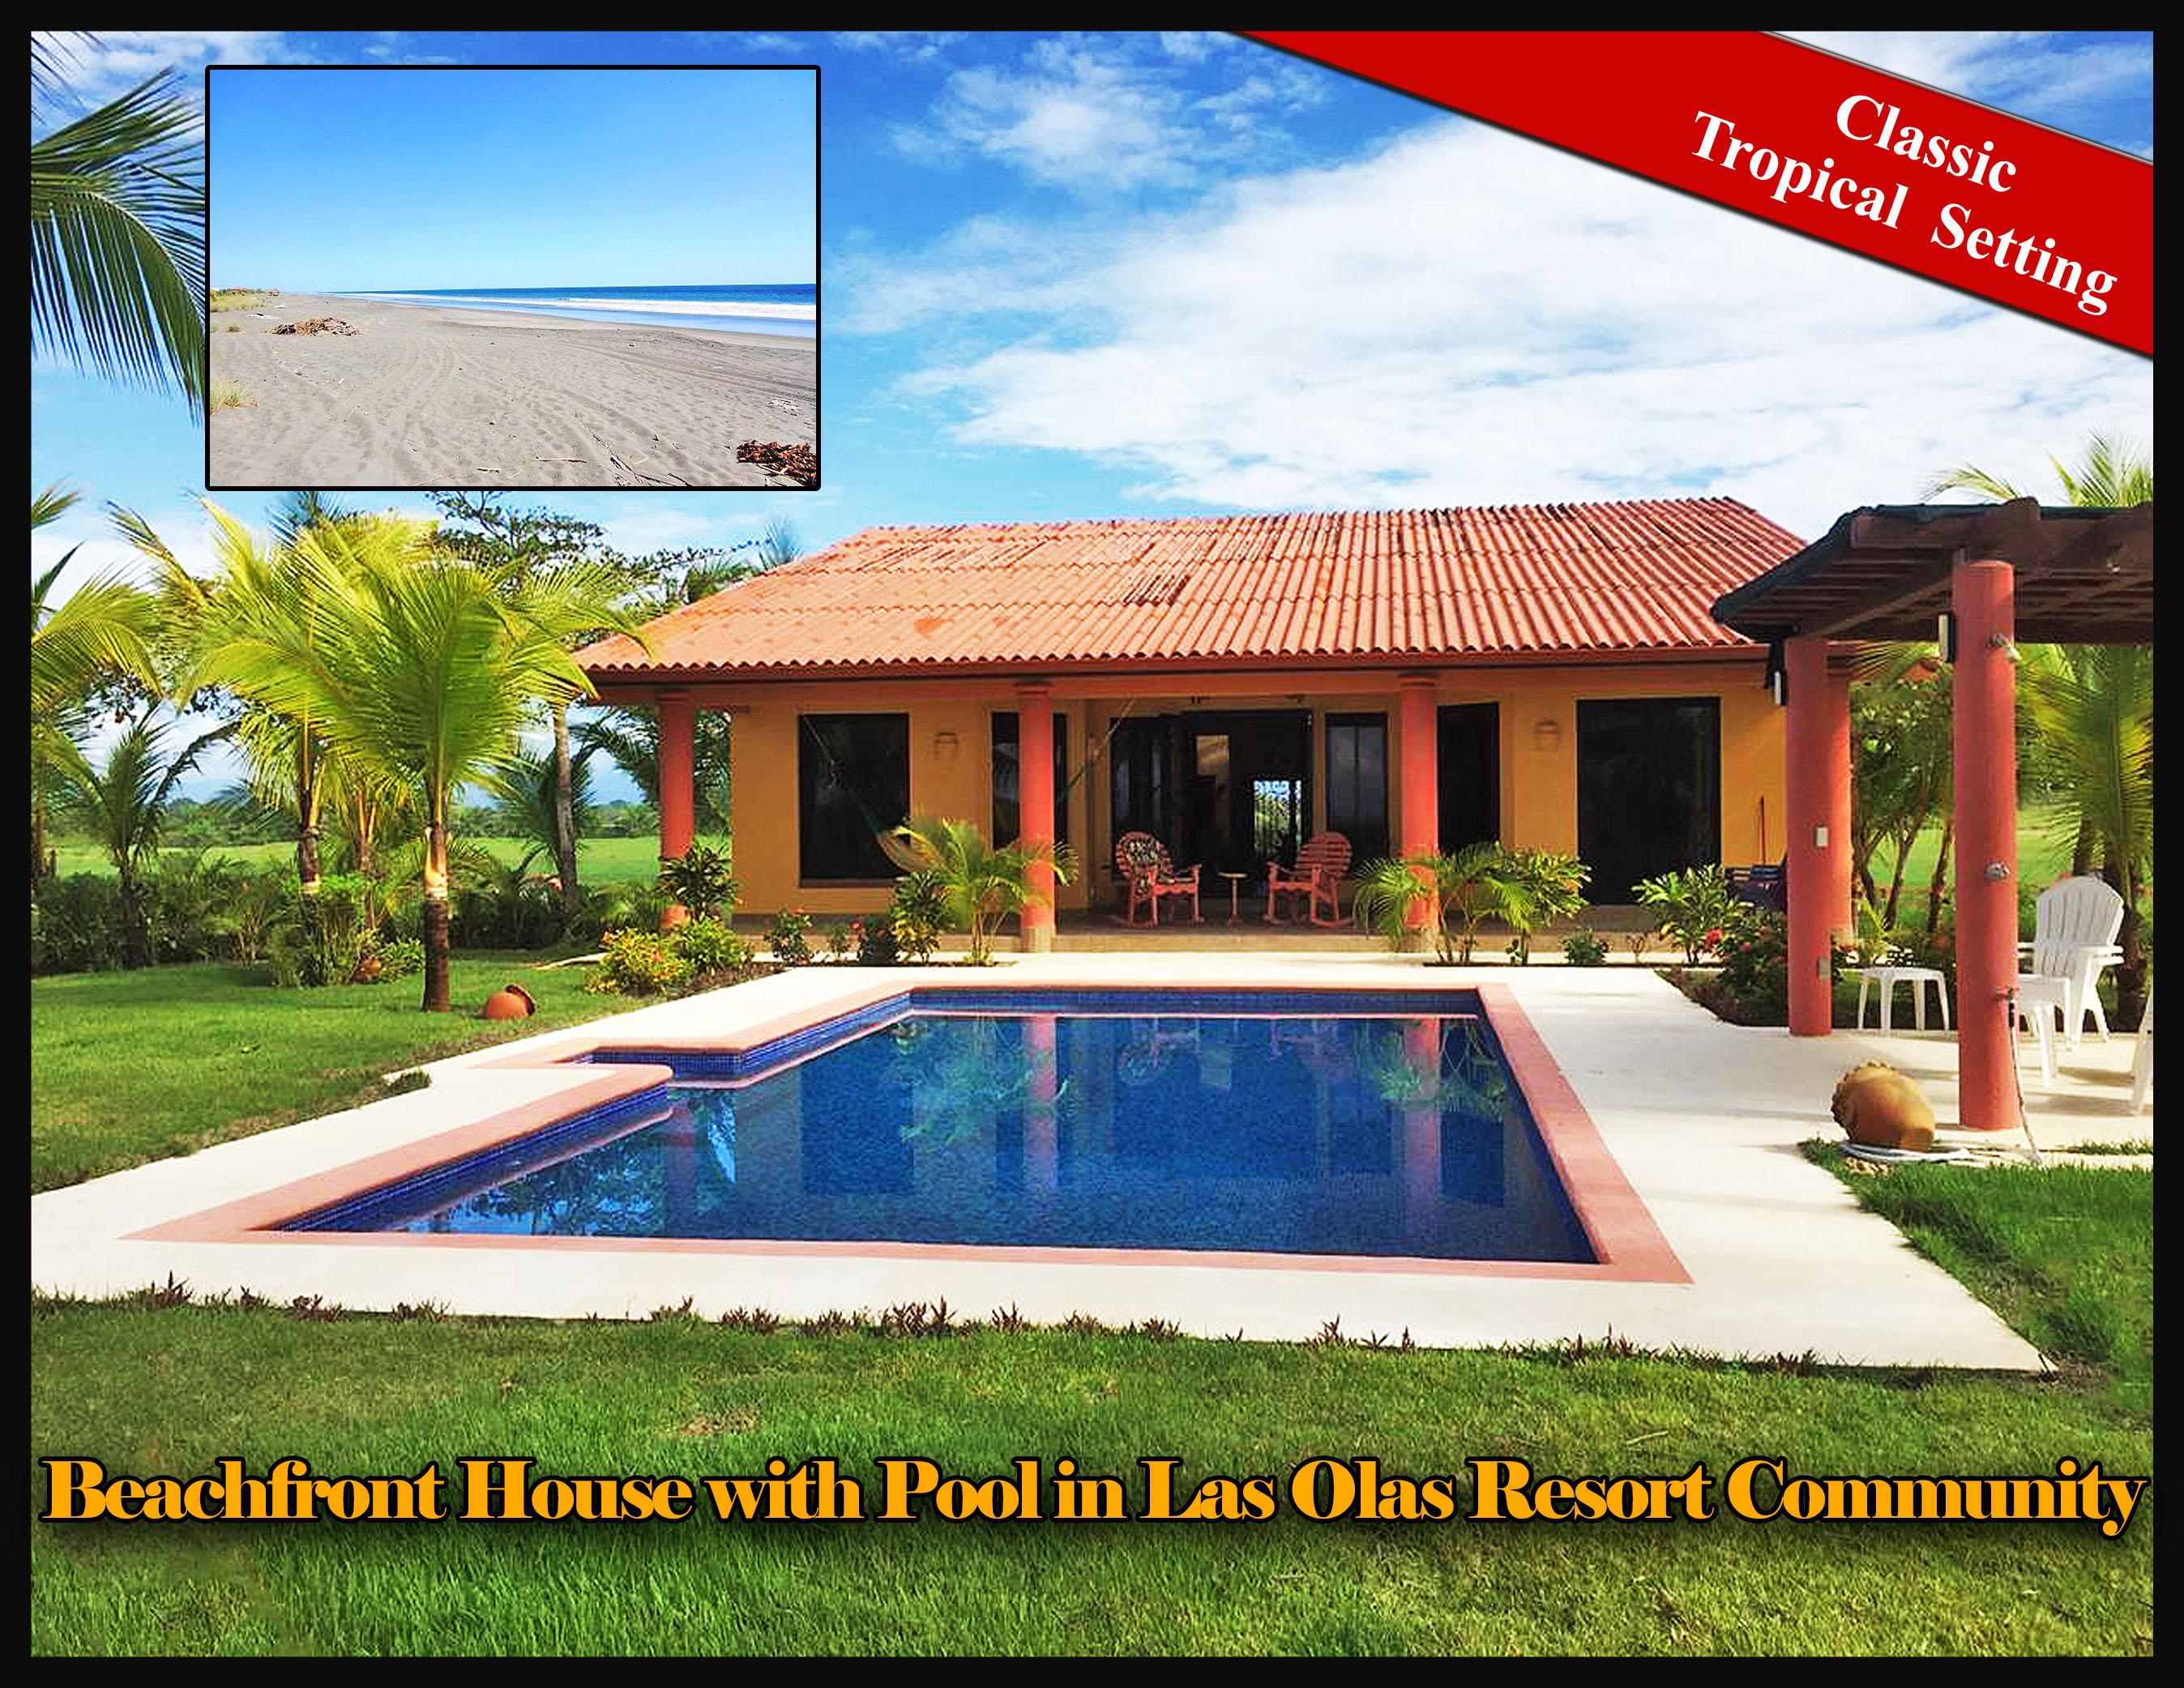 Truly Living On The Beach Beachfront House With New Pool For In Las Olas Resort Community Panama Furnished Verdaderamente Vivir En La Playa